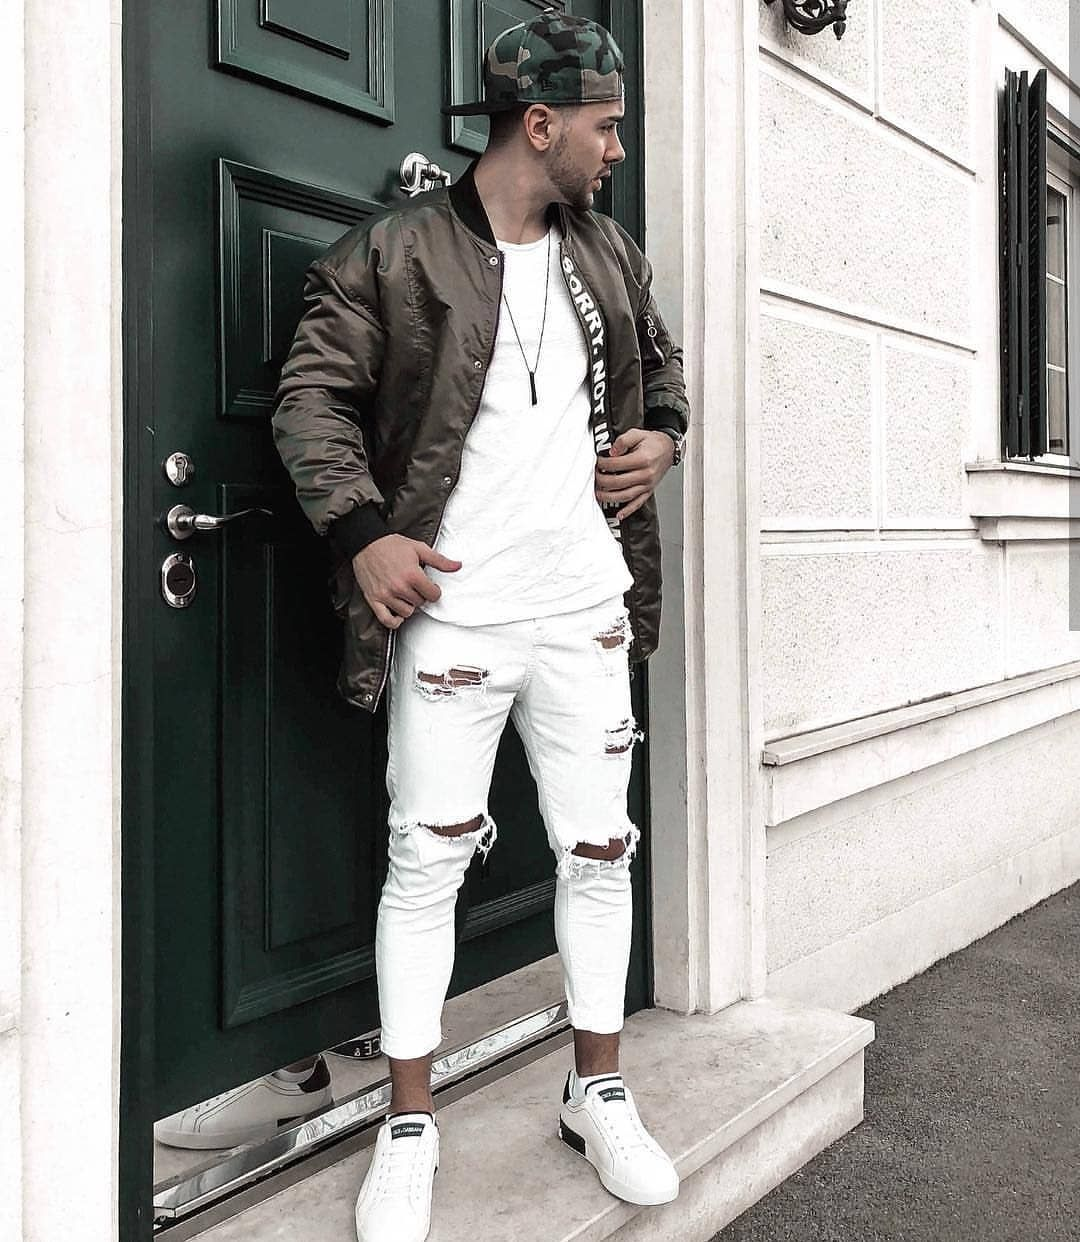 FOR YOUR INSPIRATION follow  savagelook  fashion  style  street  streetwear   ripped  urban  stylish  inspiration  fashionlover  jeans  shirt   sweatshirt ... 0973161dde5